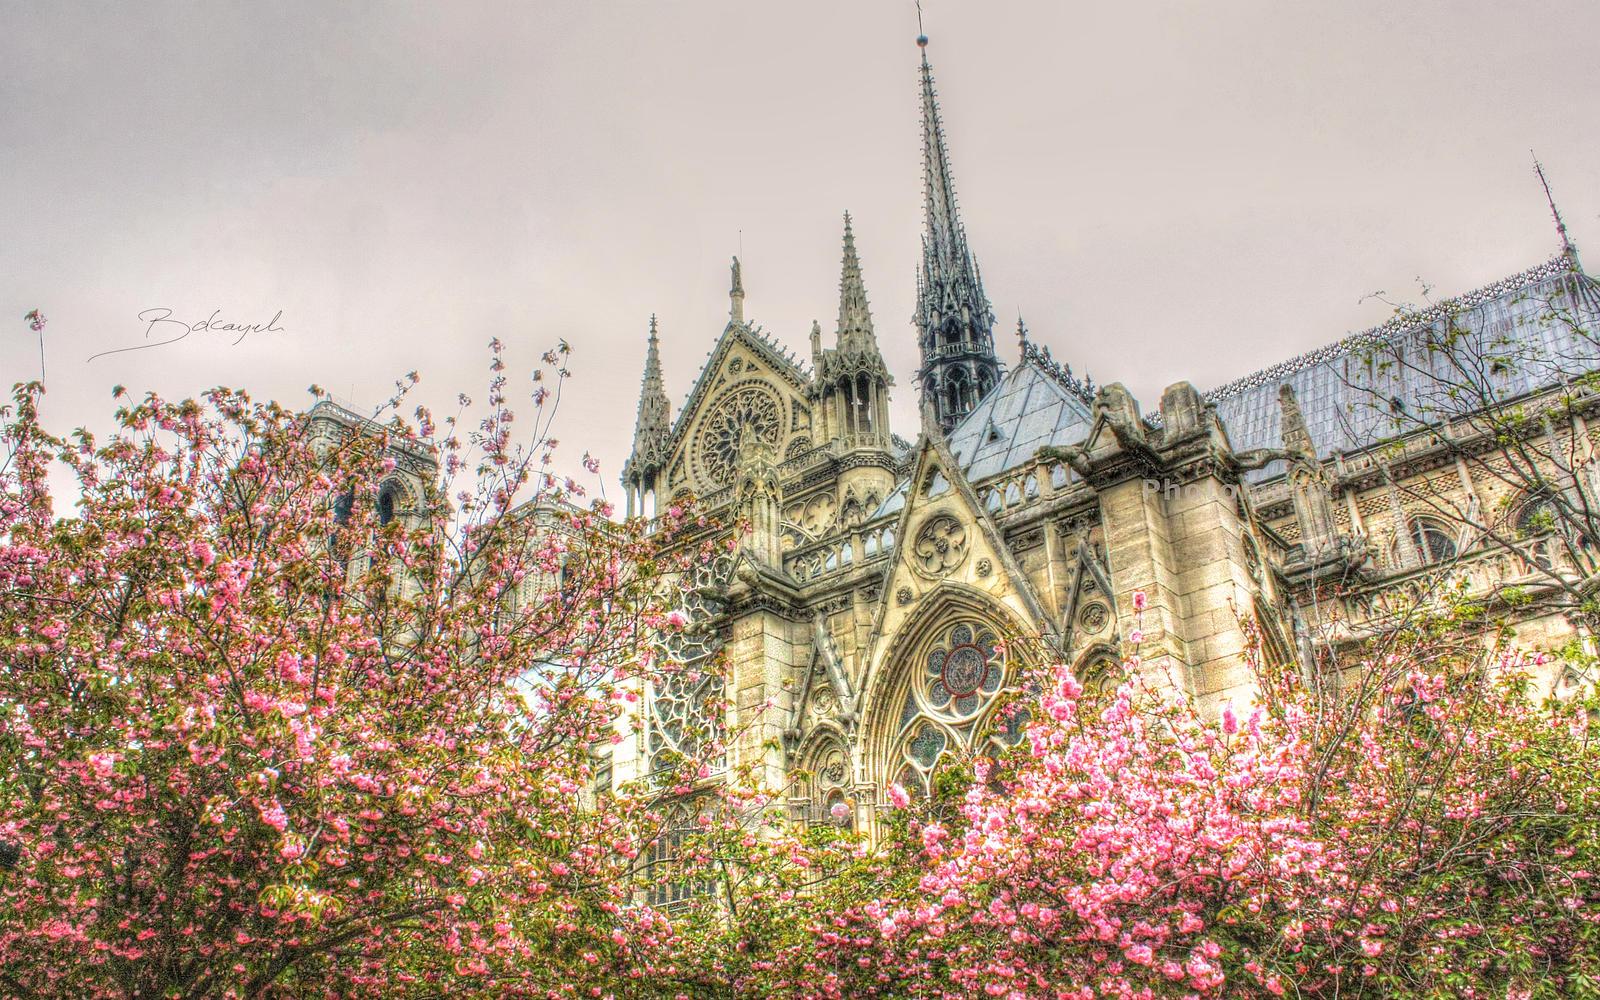 Notre Dame de Paris by bokayeh